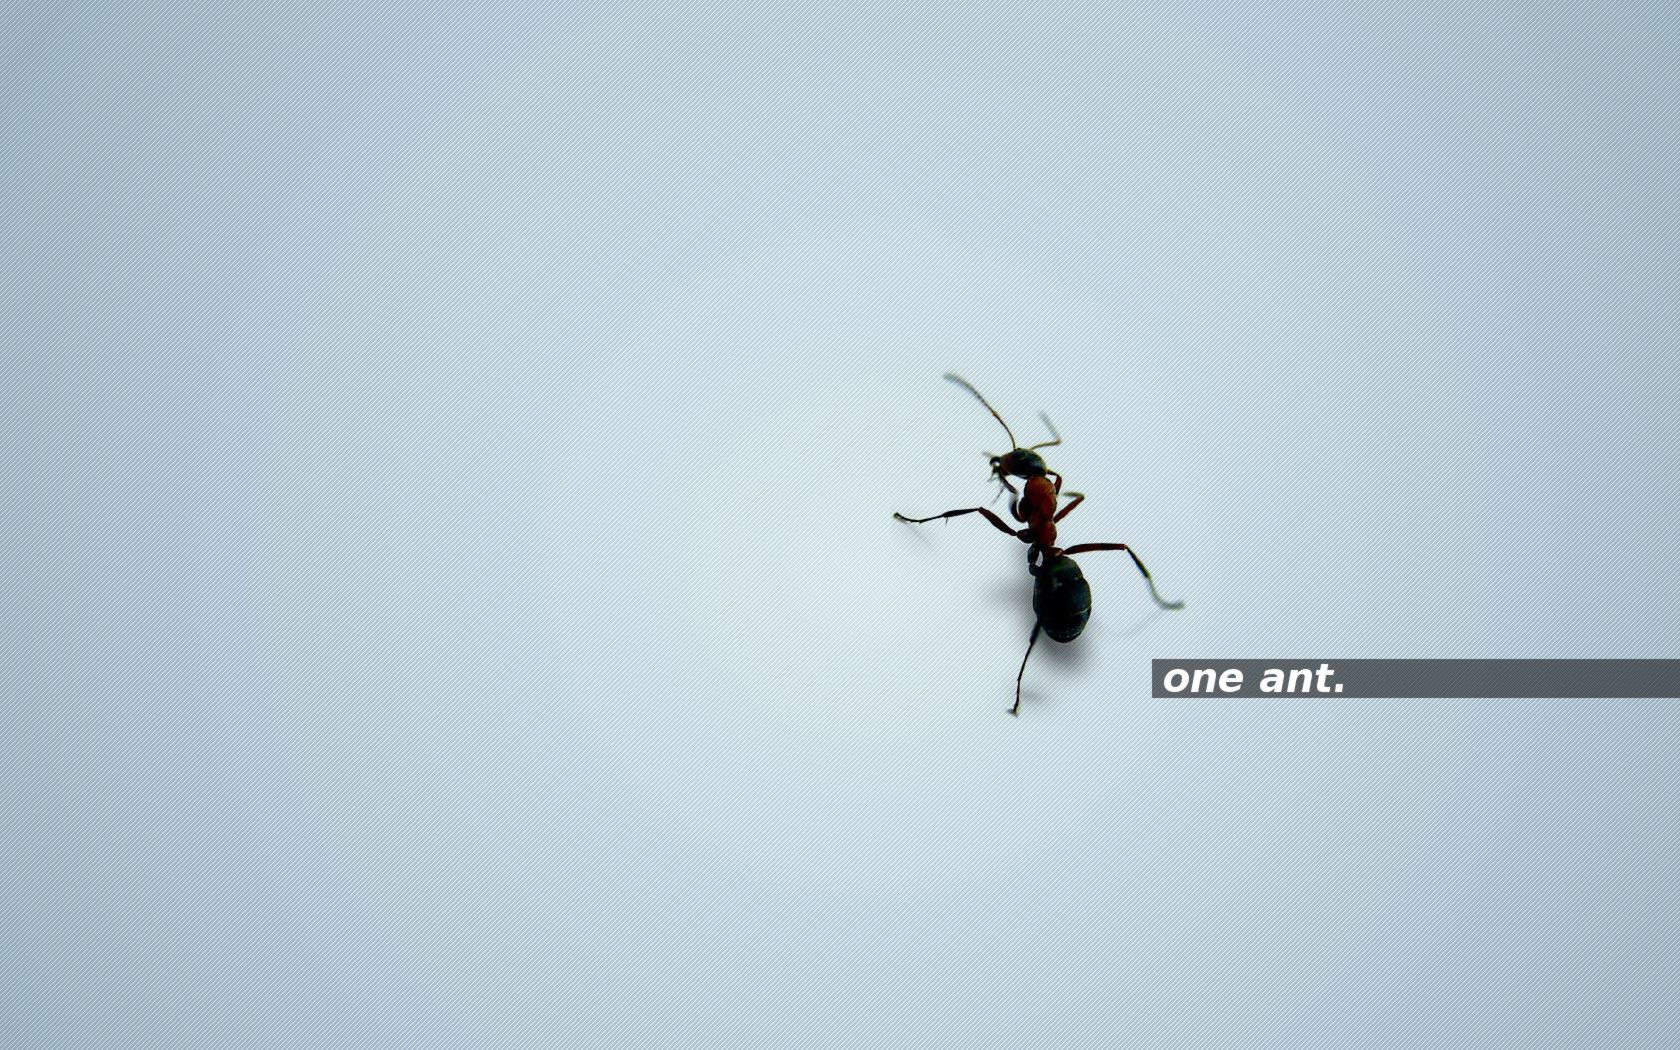 one ant. brightblue